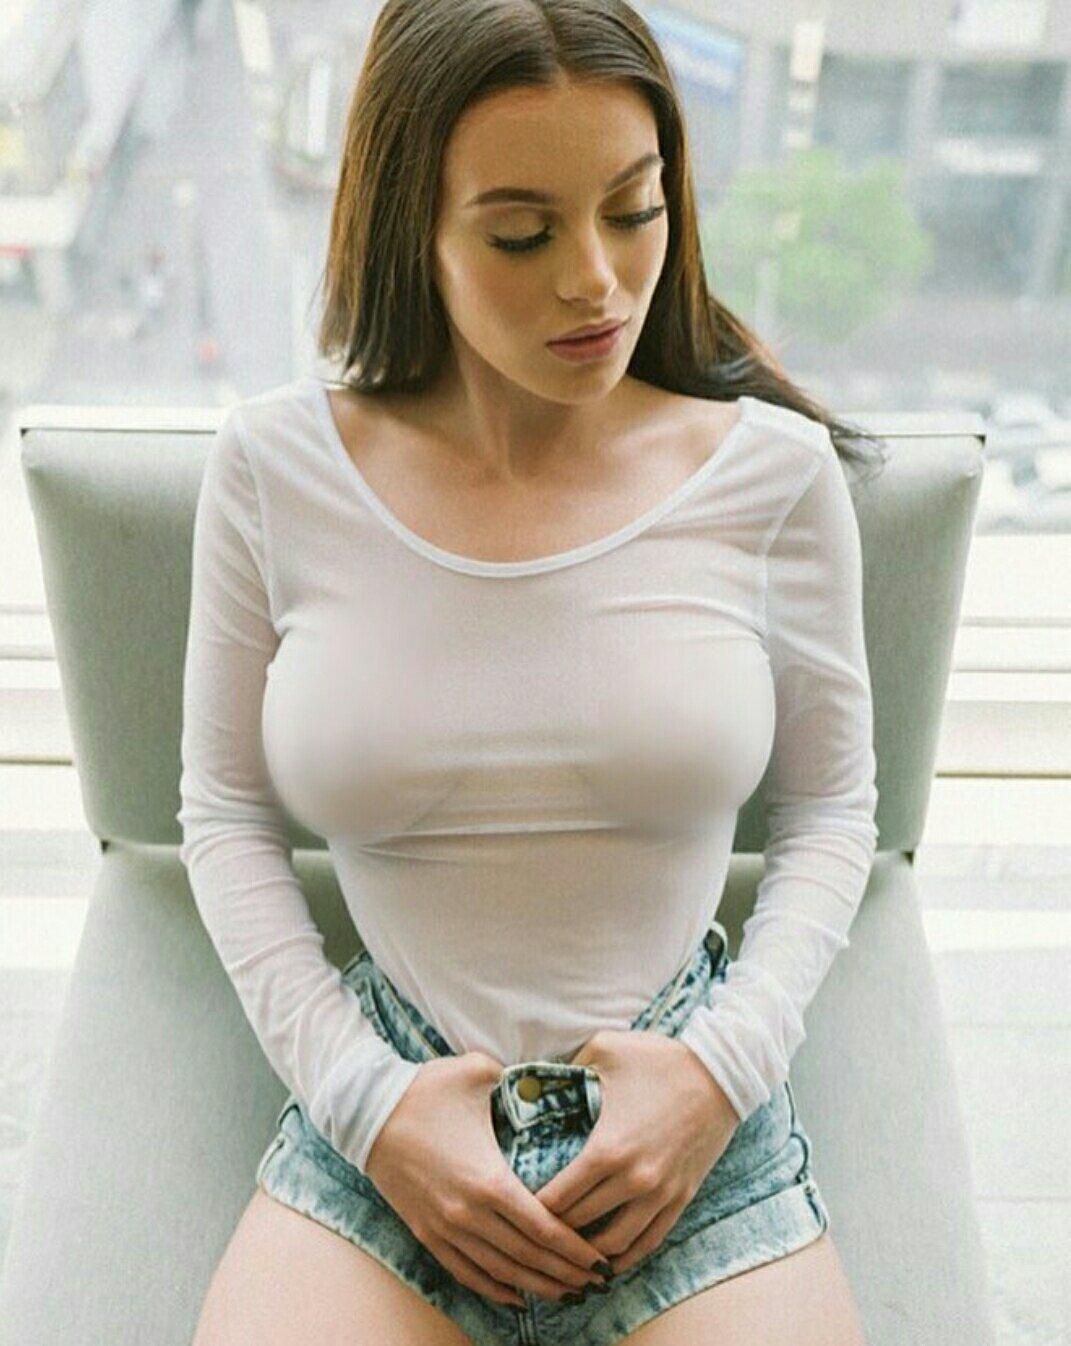 Lana Rhoades August Ames